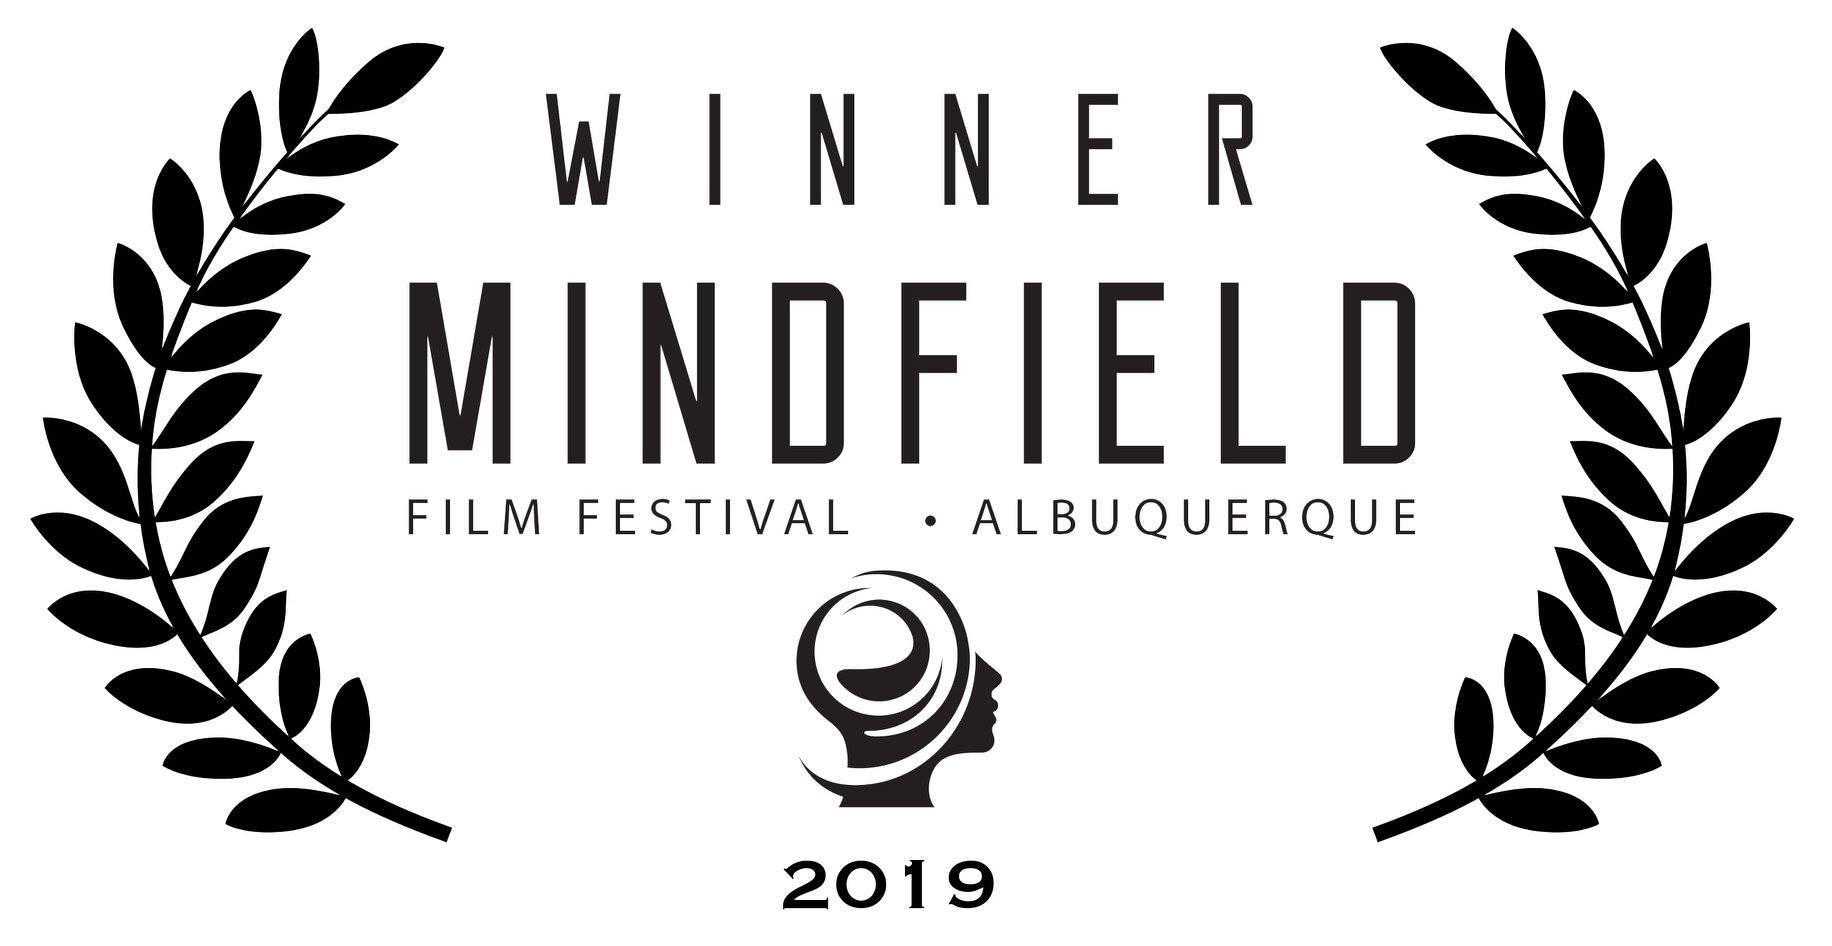 MindfieldFilmFestival.jpg